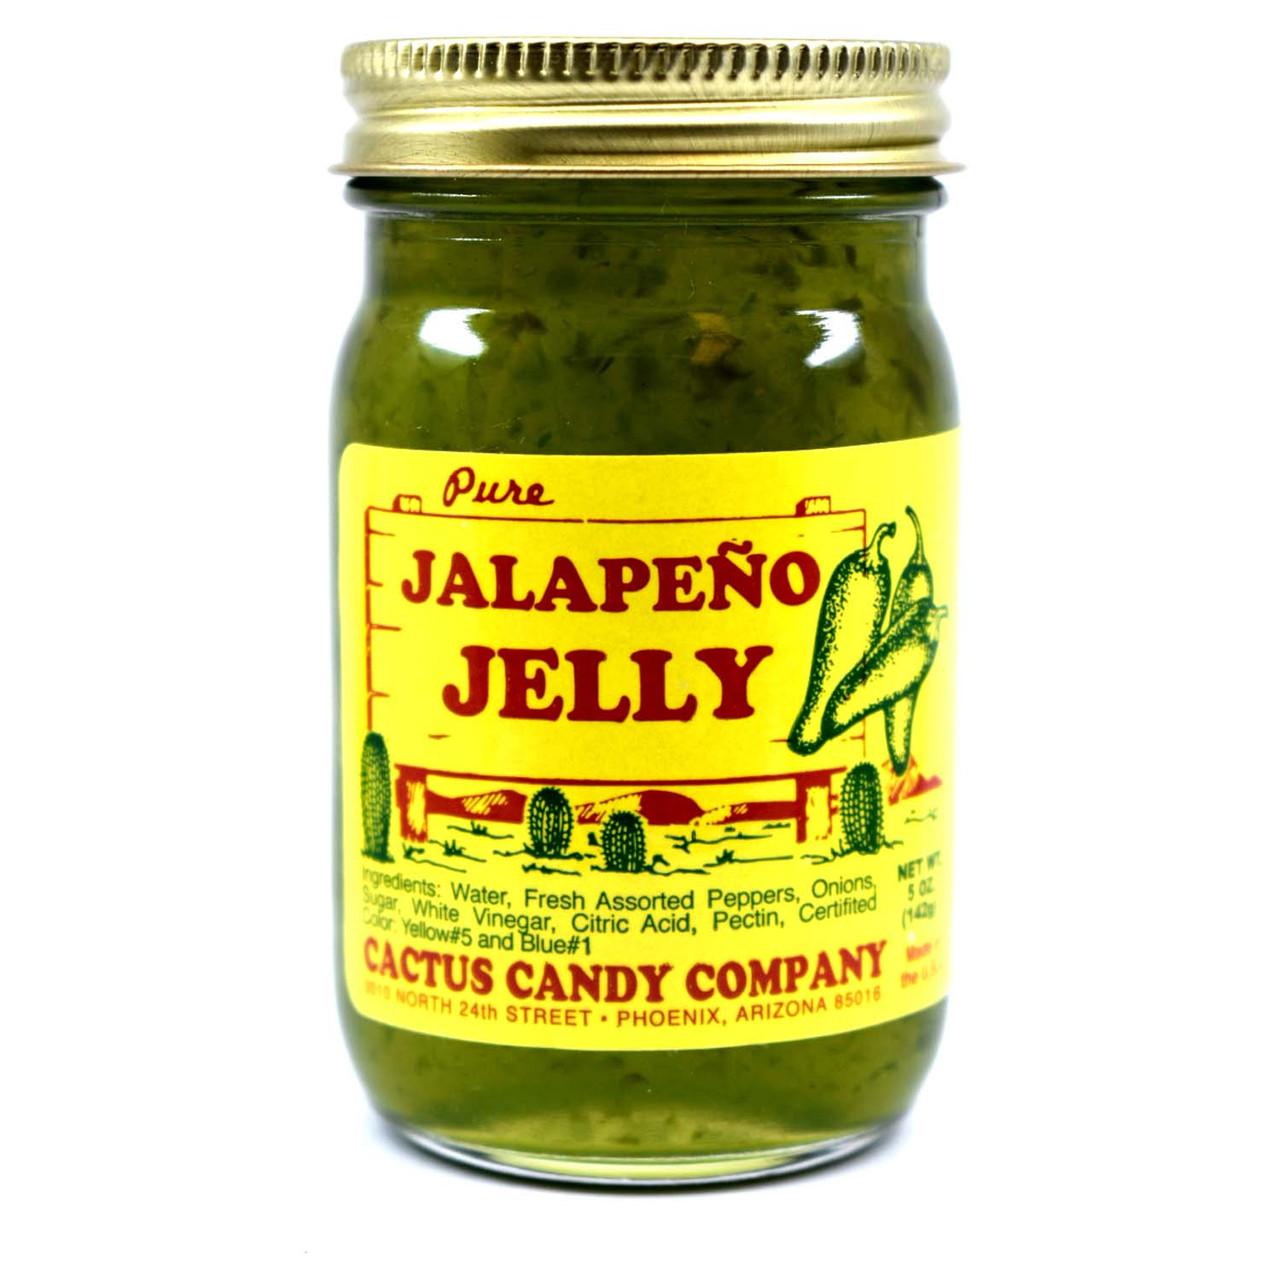 Jalapeno Jelly 5oz Glass Jar